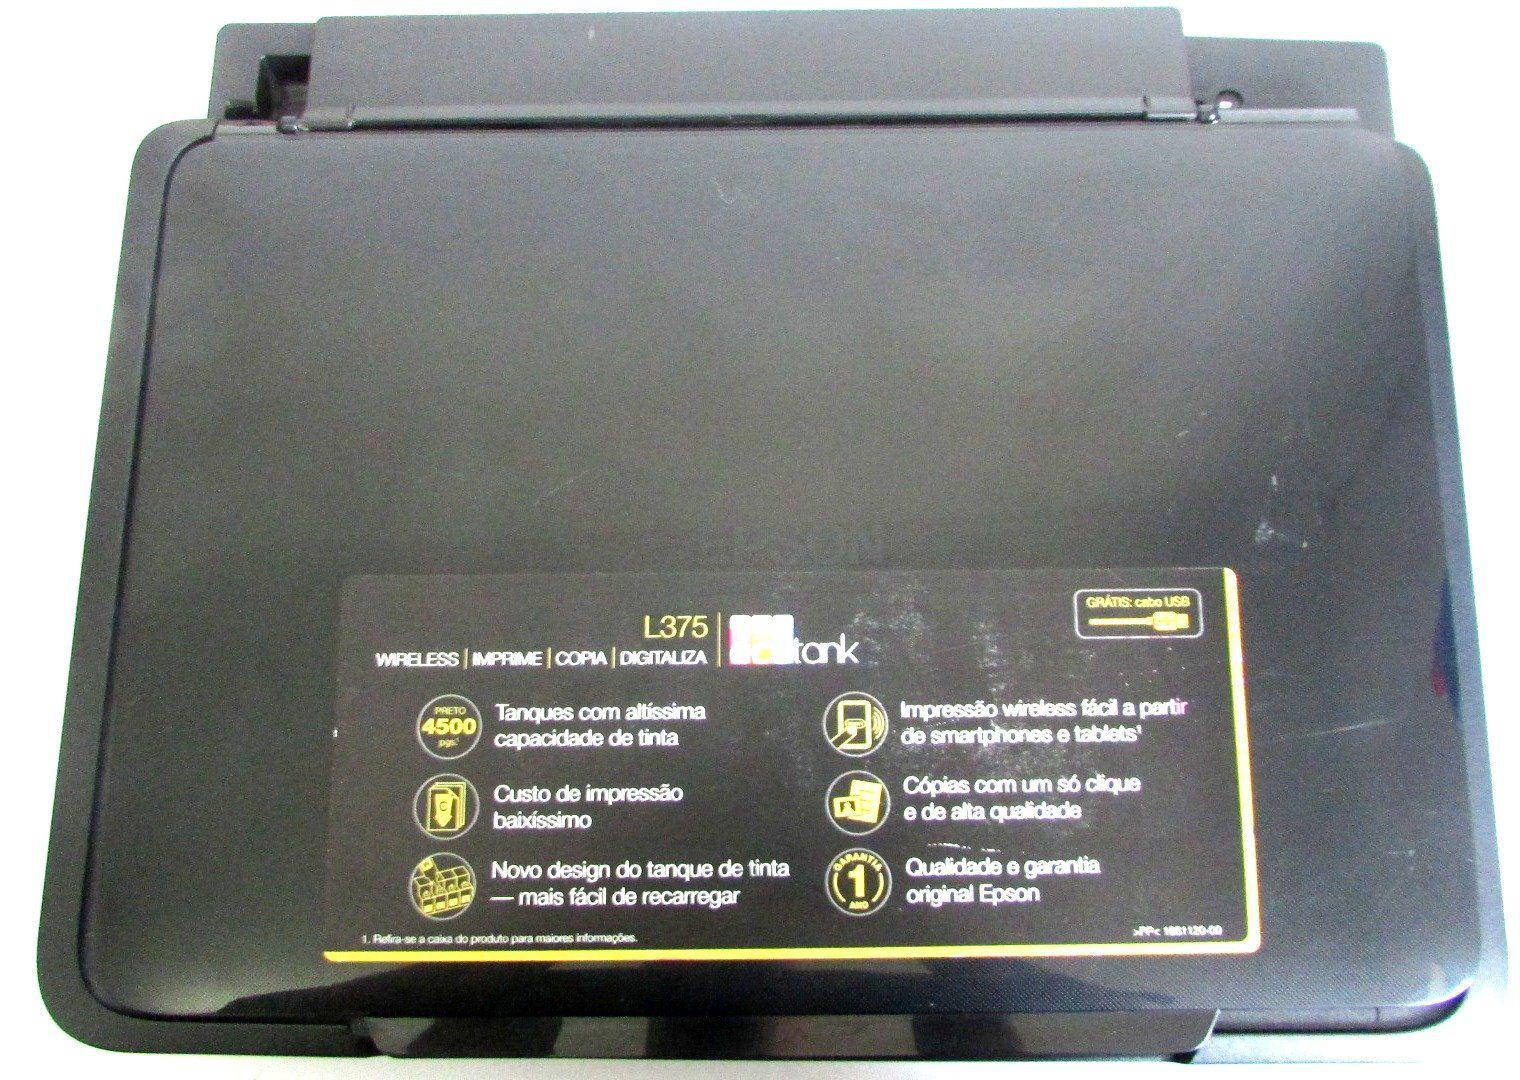 Scanner Completo s/ Painel Impressora EPSON L375 (semi novo)